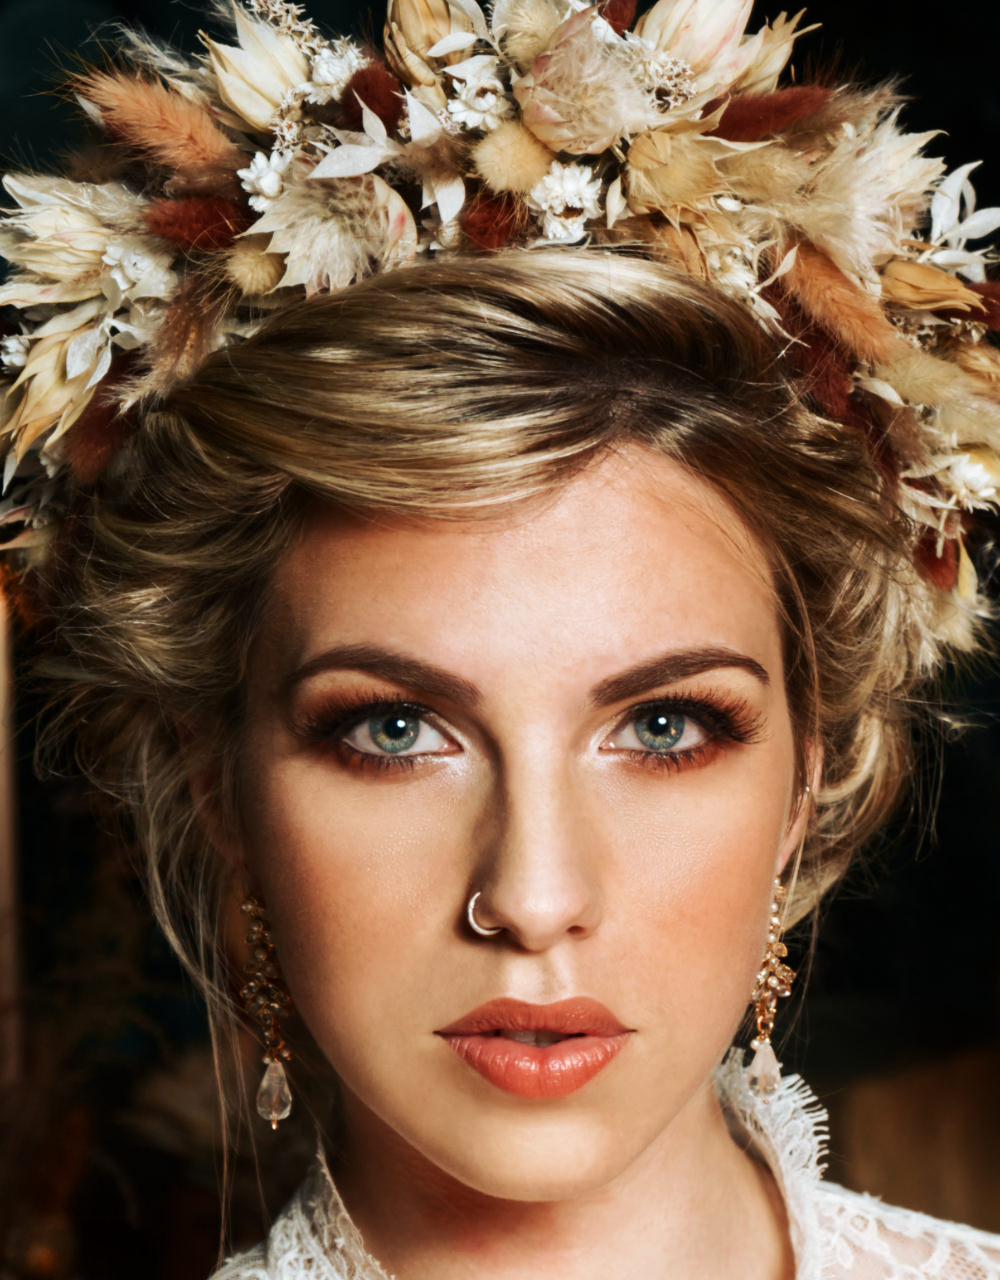 Bride Bridal Make Up Flower Crown Moroccan Wedding Inspiration Luke Batchelor Productions